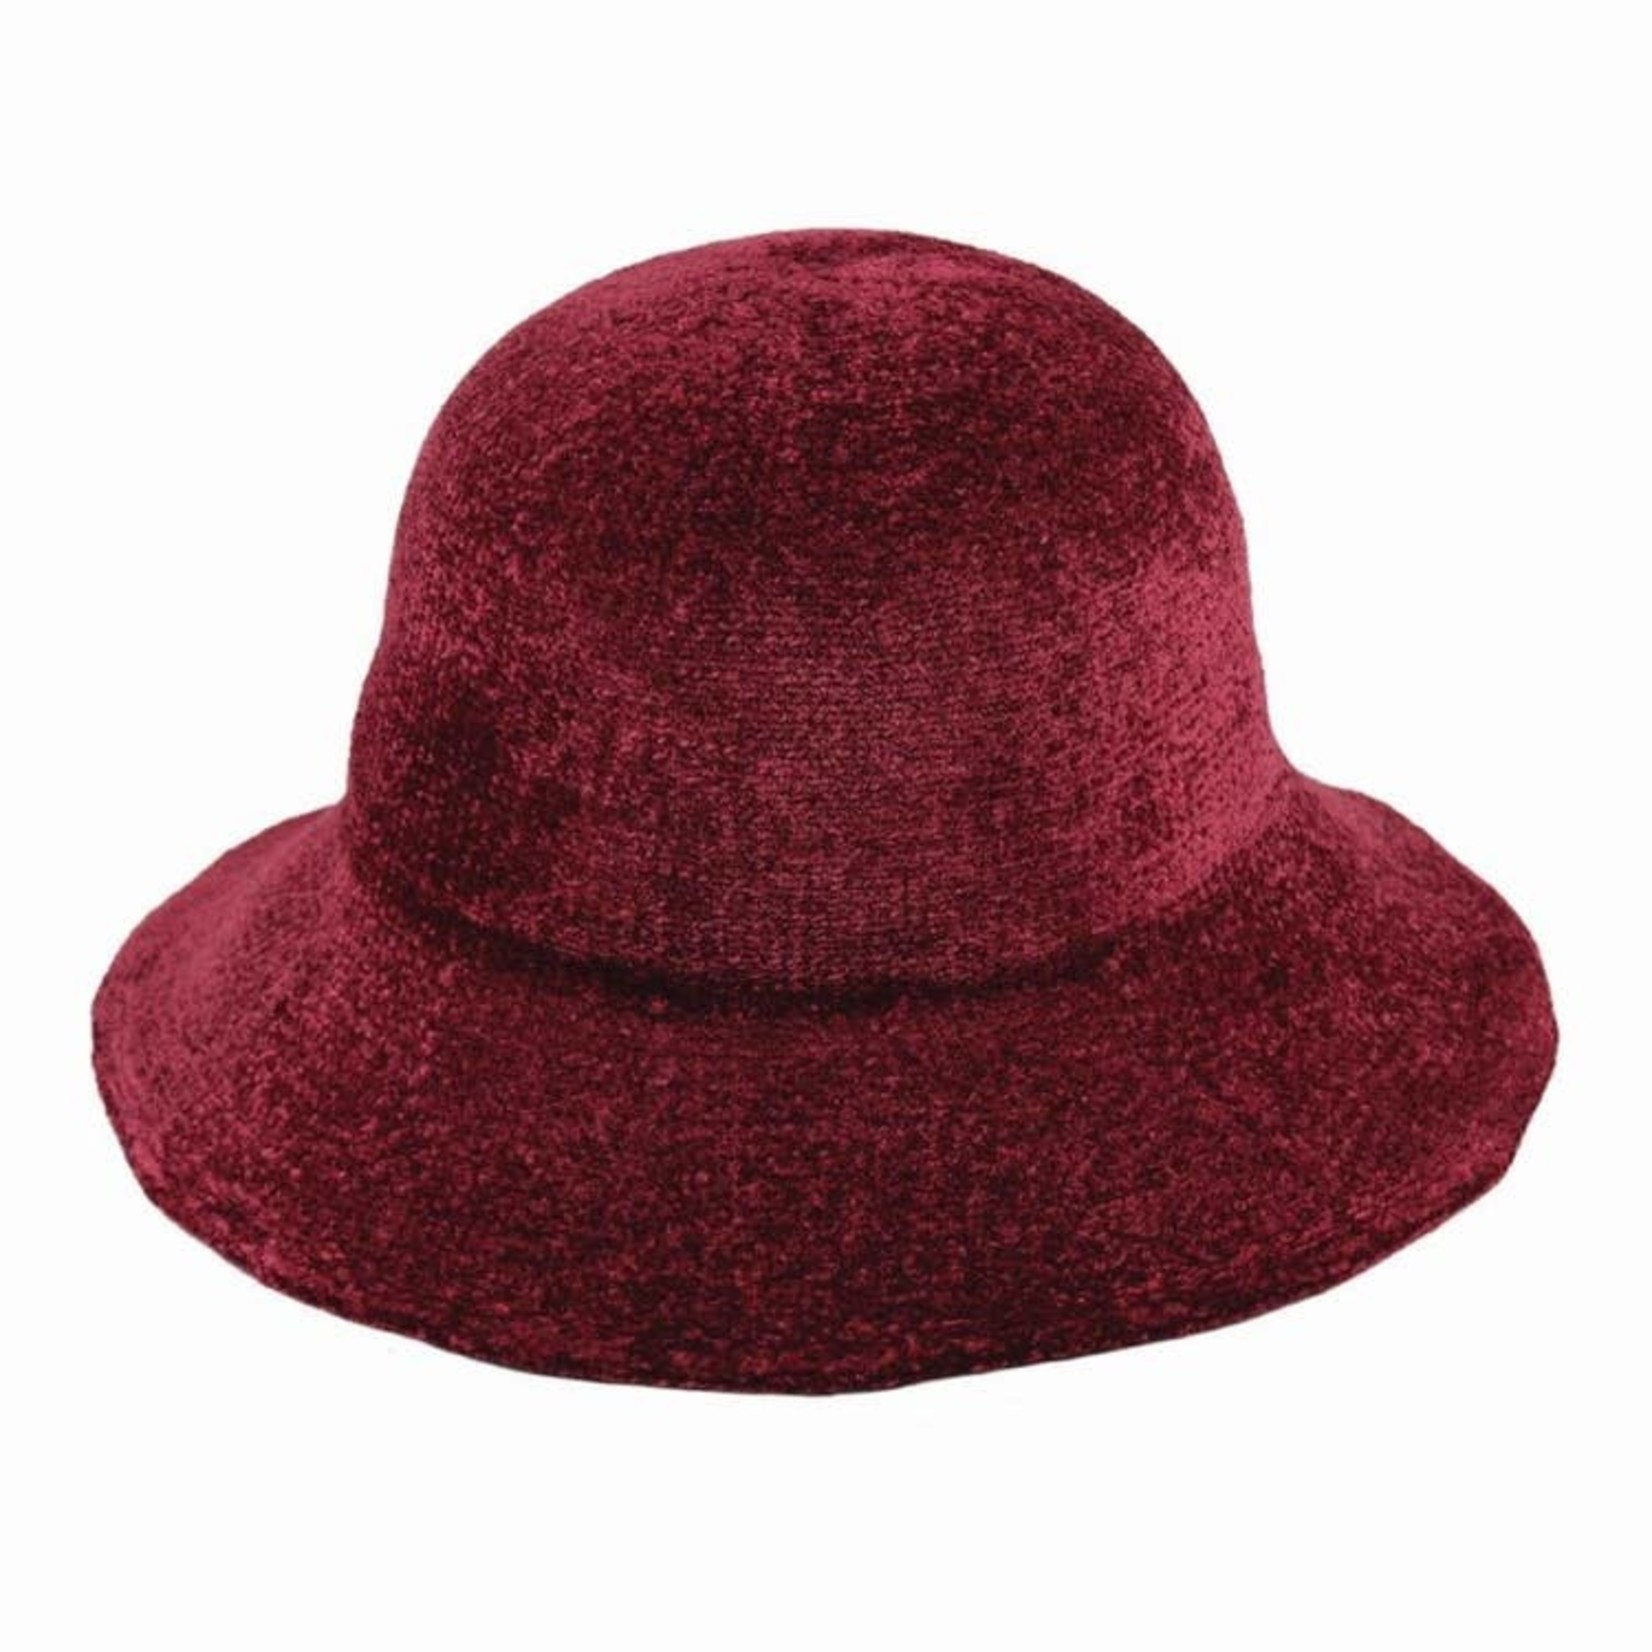 Jeanne Simmons 100% Chenille Floppy Brim Hat - Burgundy